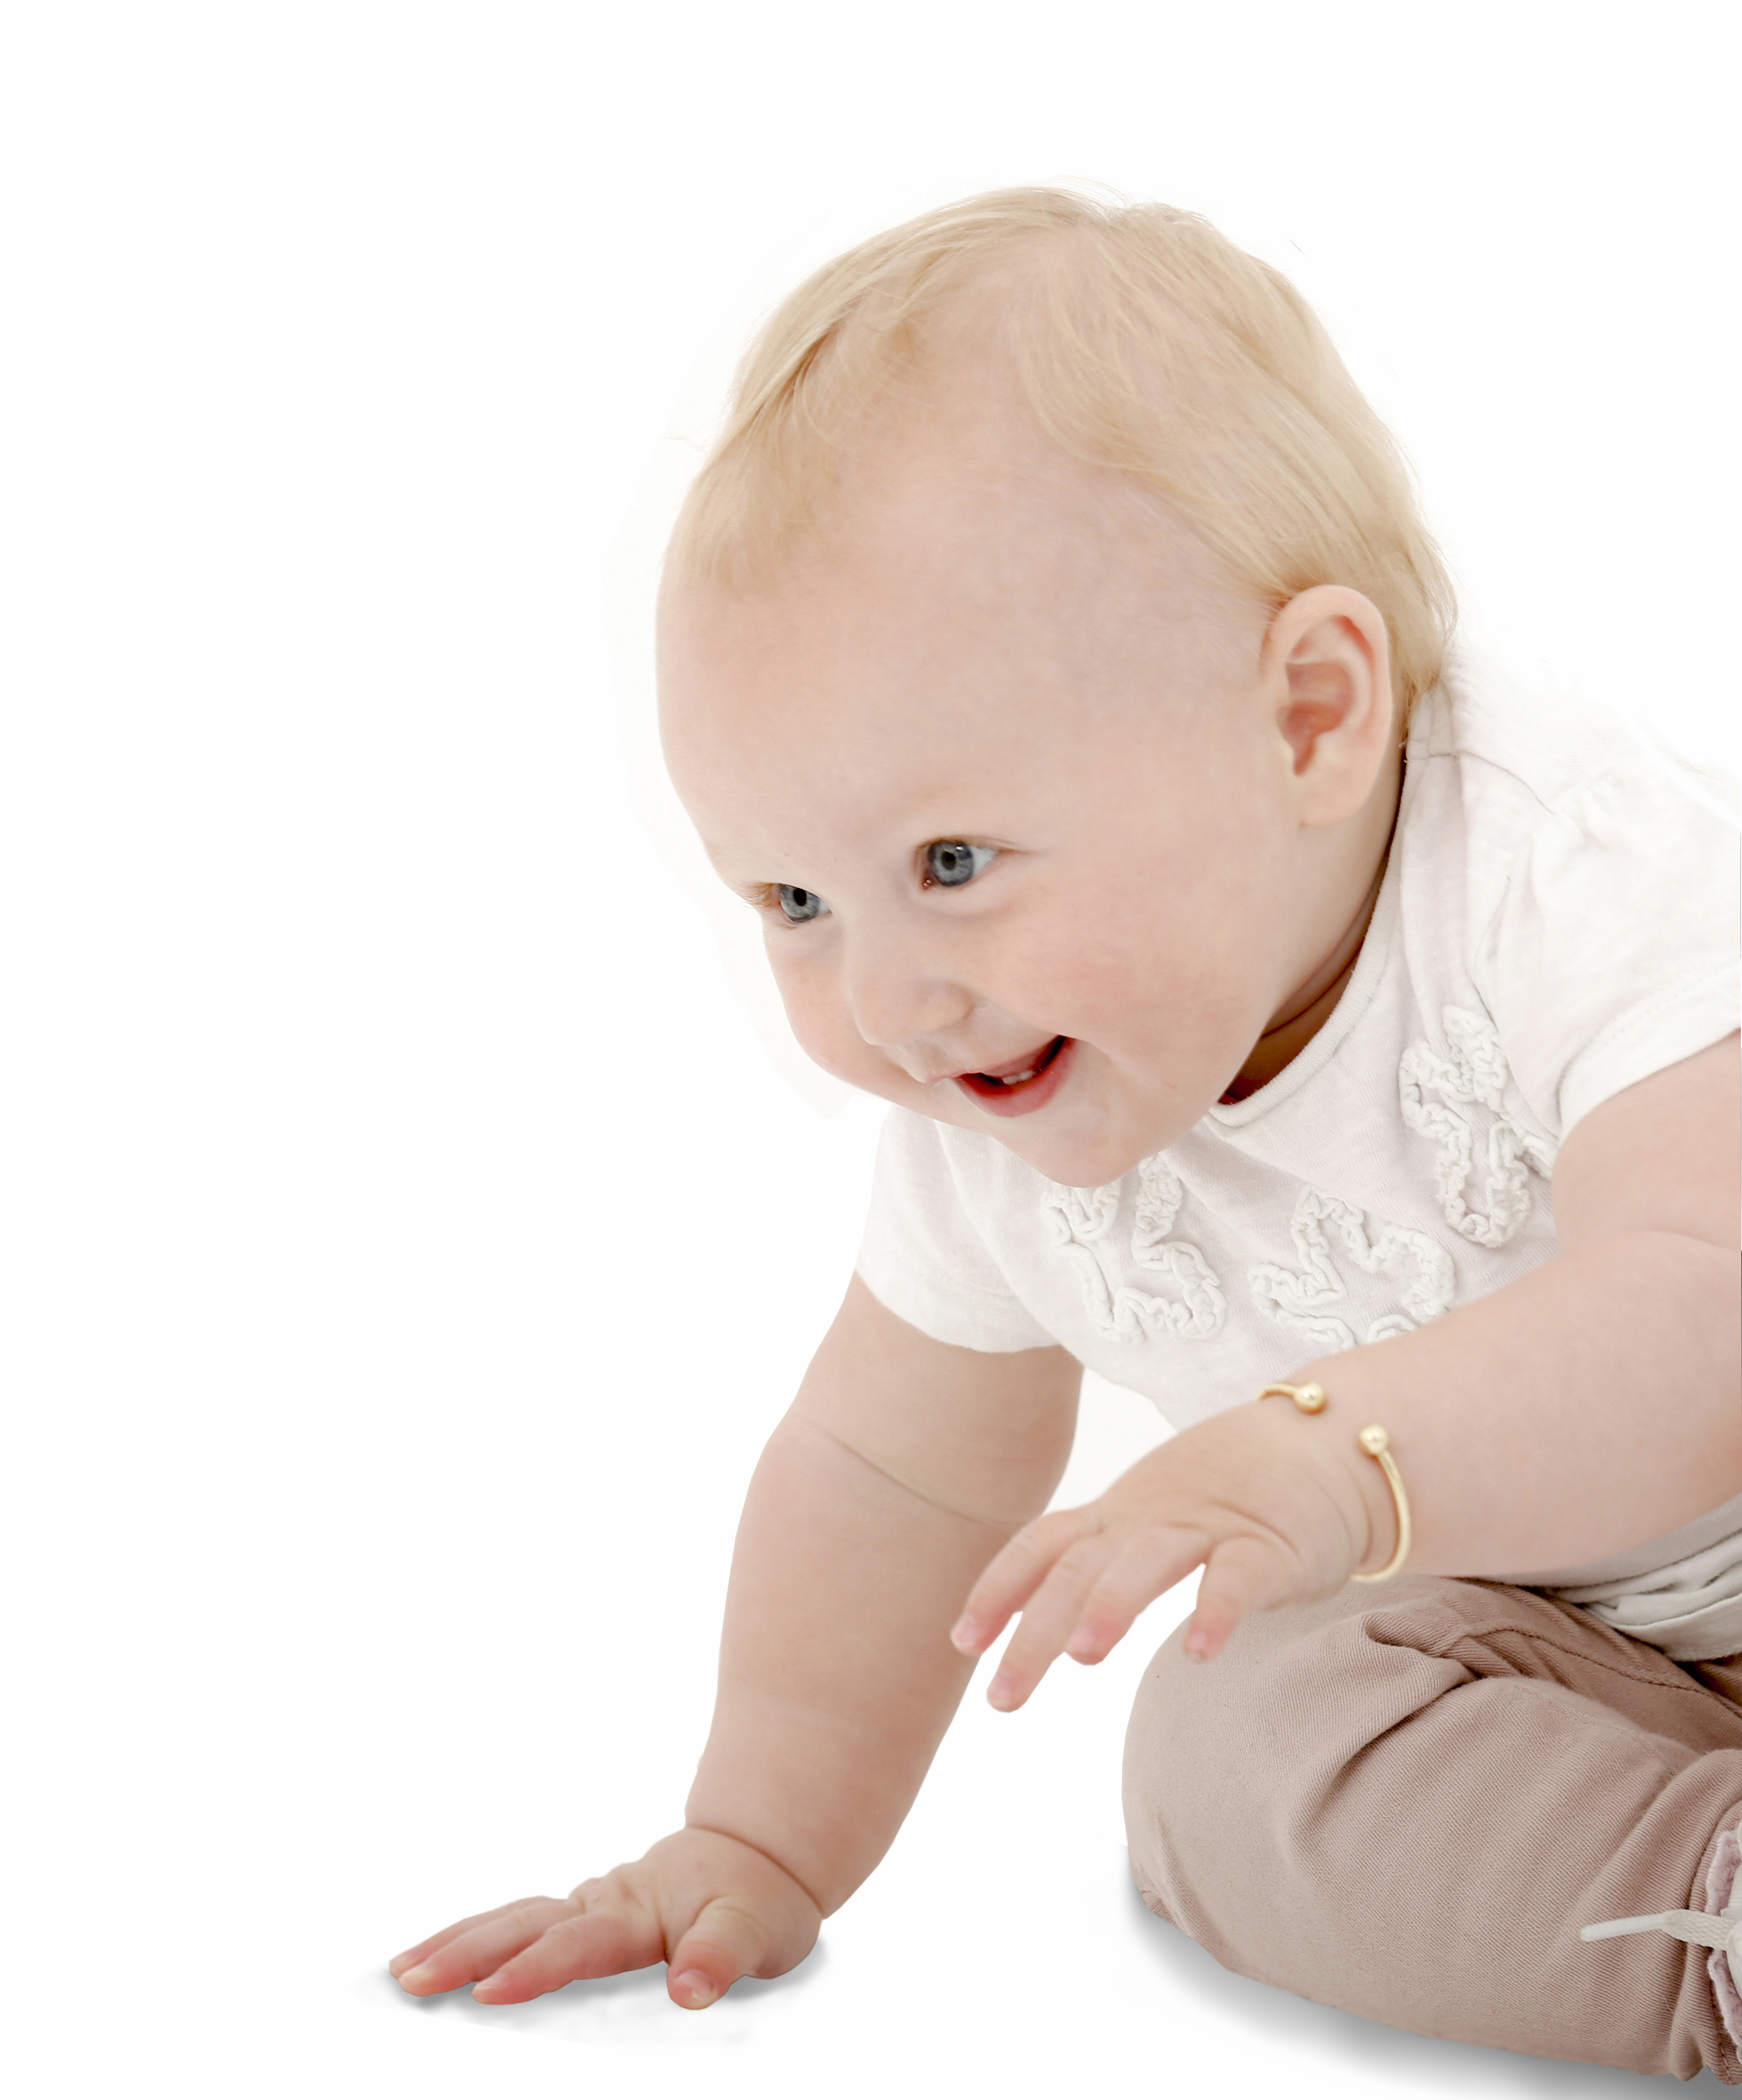 baby photoshoot by Danarus